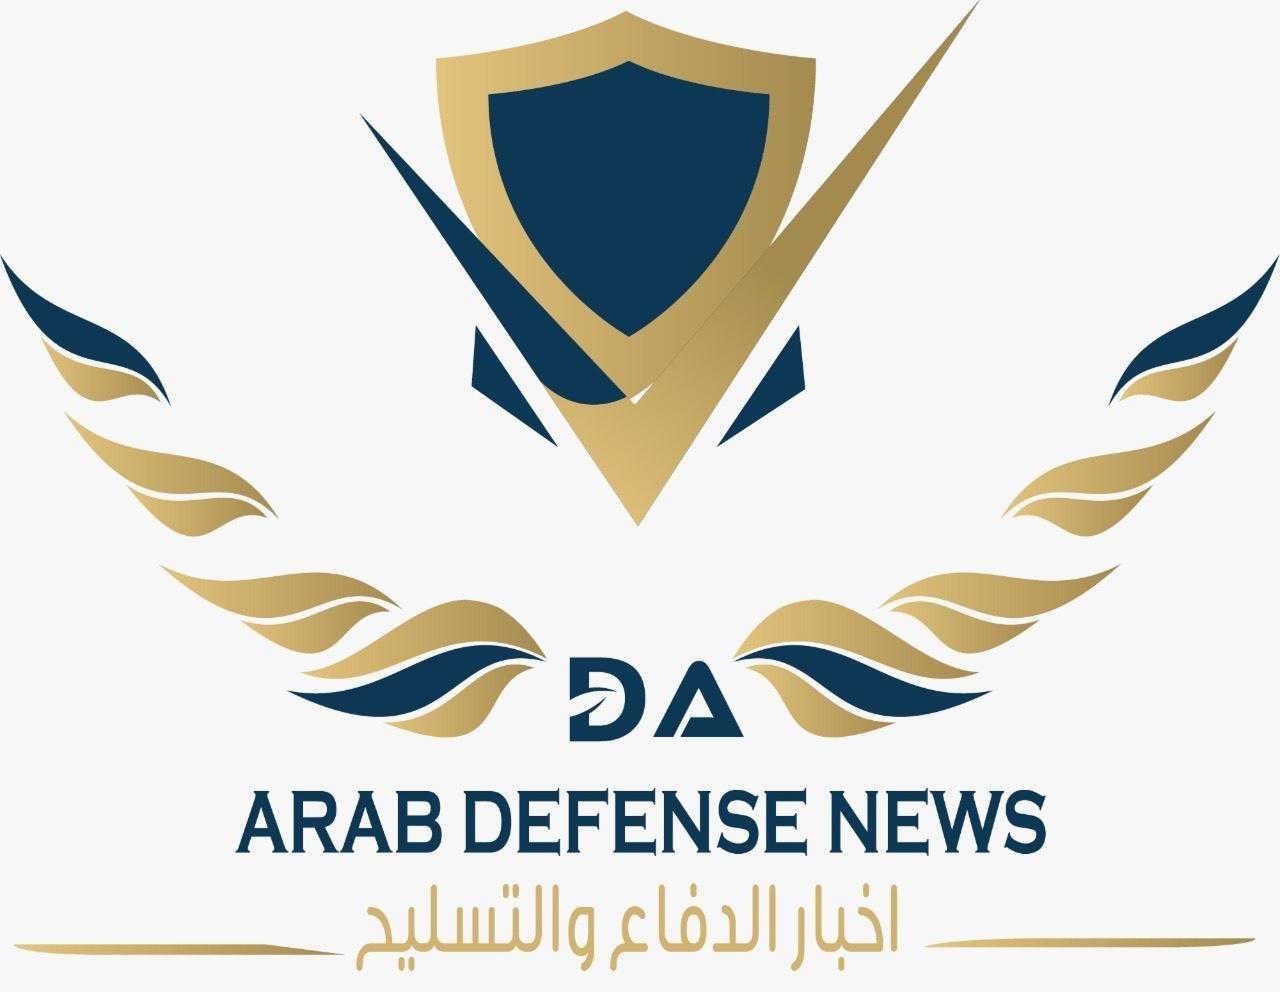 Arab Defense News